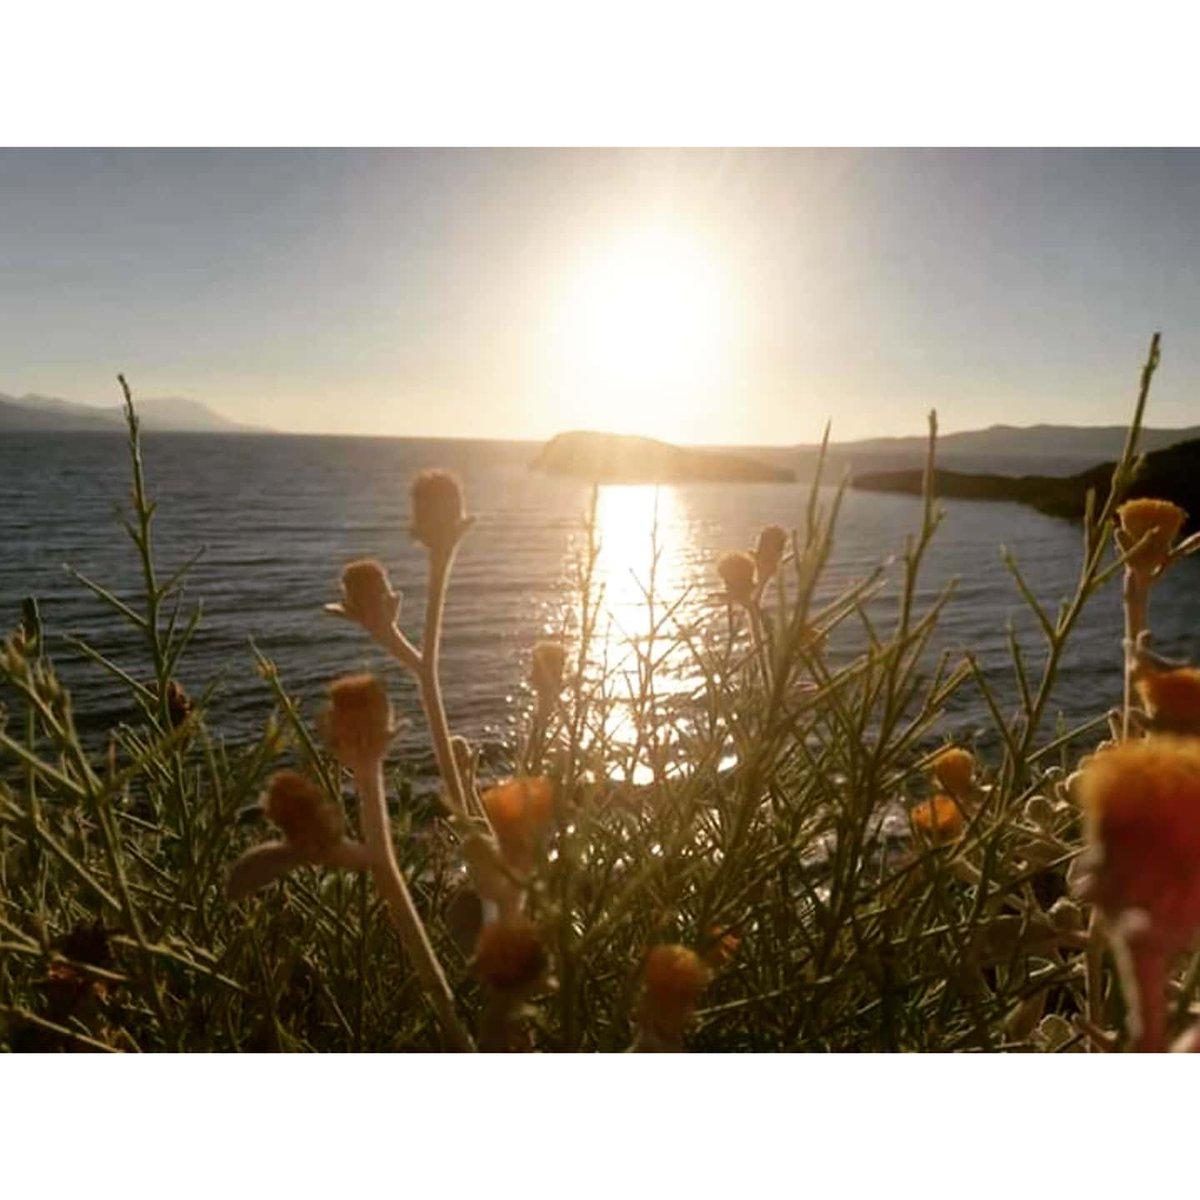 Sunset and Sea.  . . . . #trekking #trekkingphoto #artwork #artworks #artworks_artist #arttours #arts #galleryart #gallery #art #sailing #photography #photographysouls #photographyislife #sunset #photographylovers #naturelovers #photographers #nature #seapic.twitter.com/tXJgwZQJe0